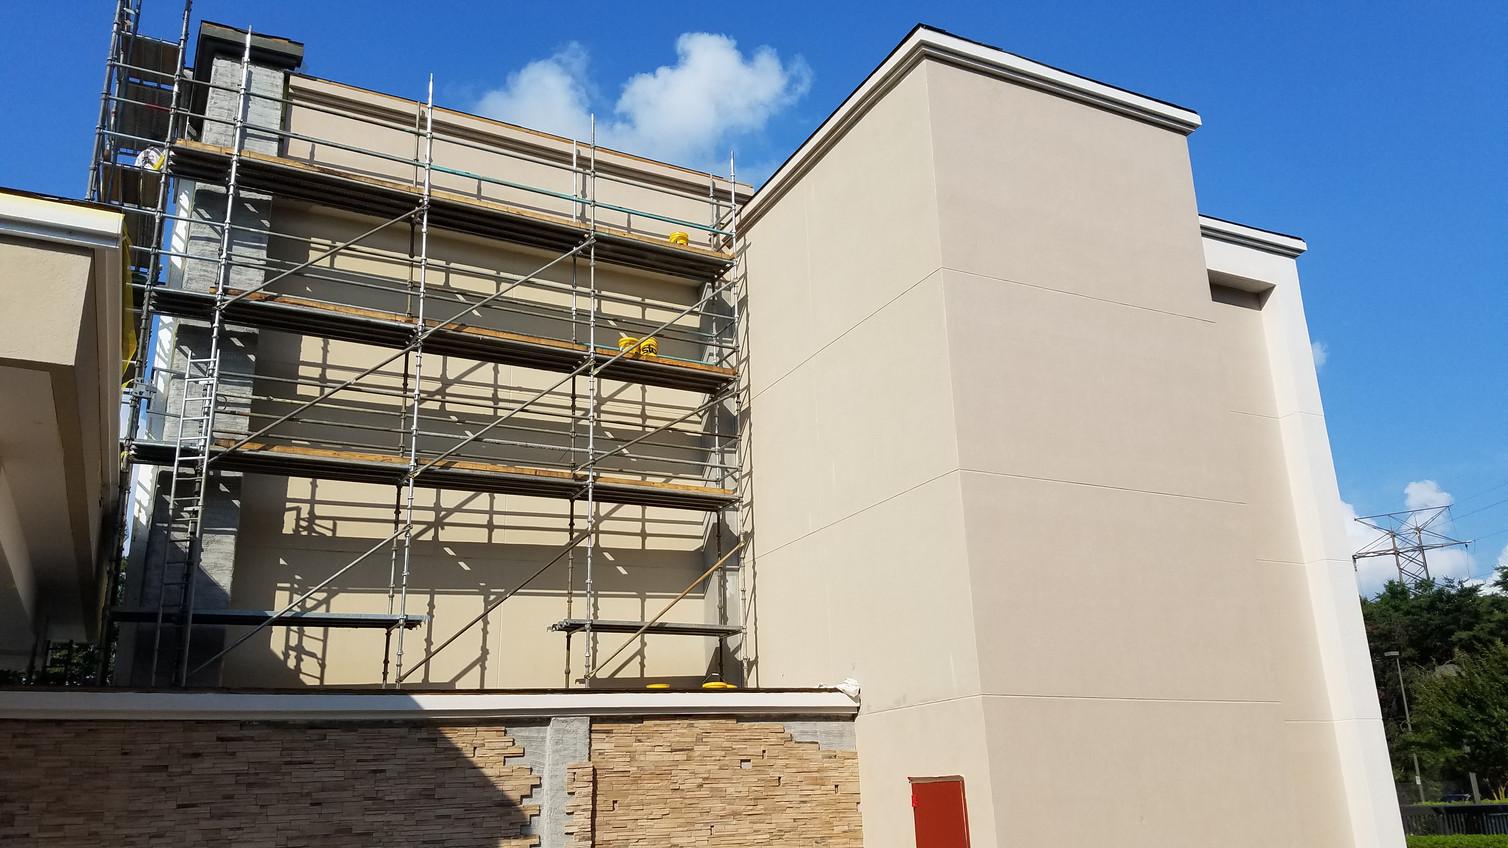 Comfort Inn Exterior Hotel Renovation Conversion During